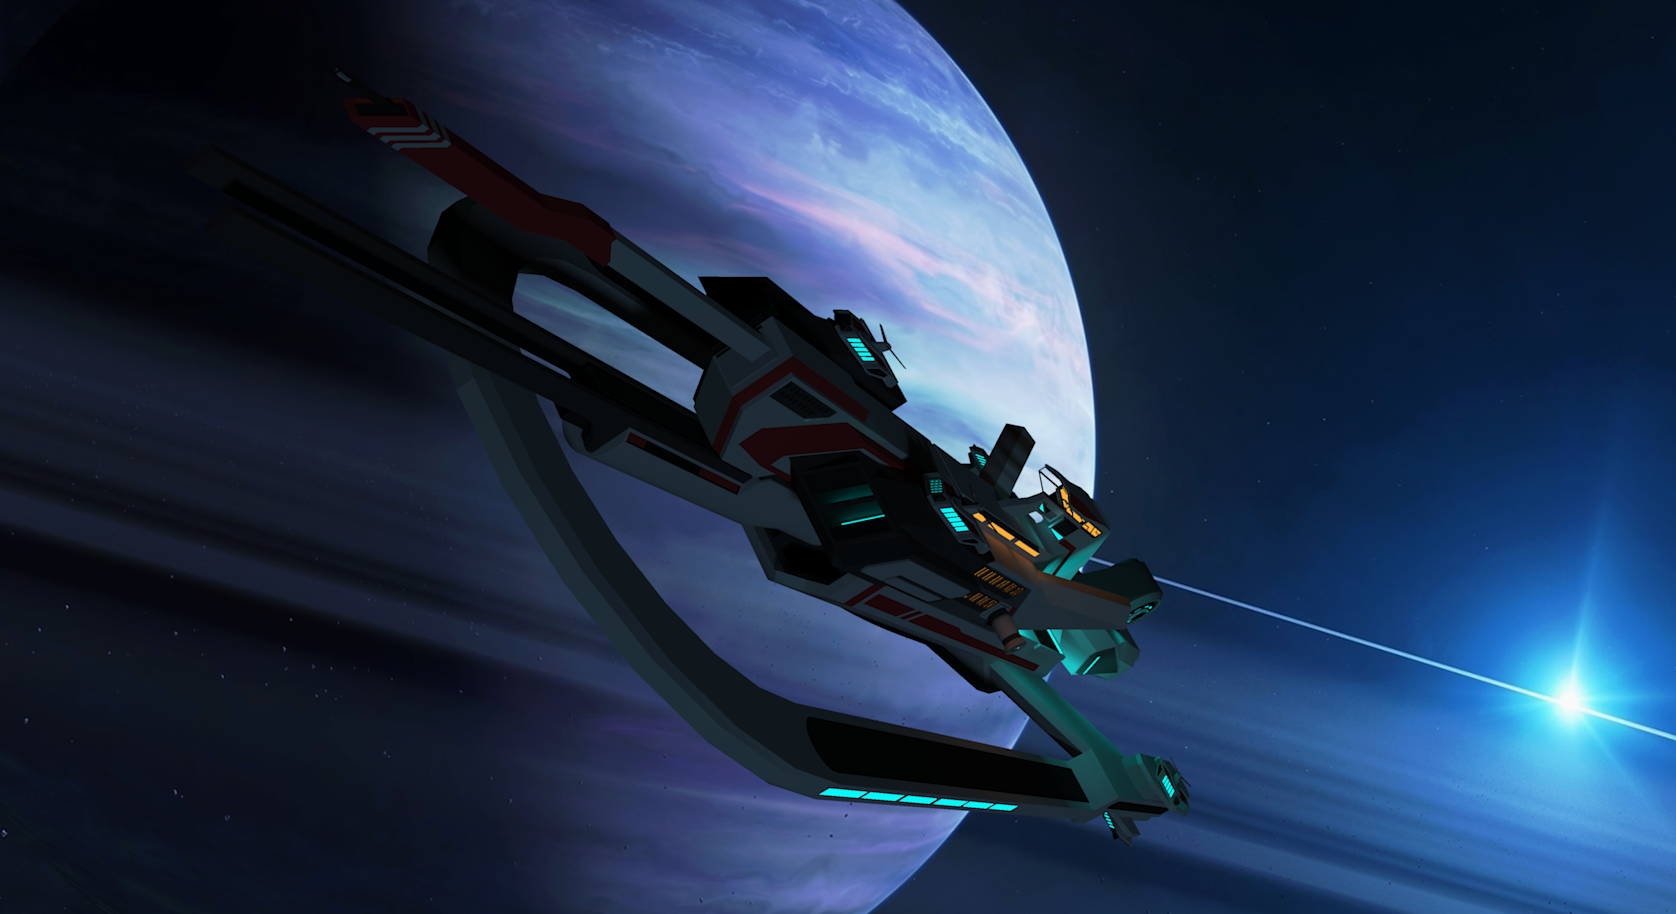 Banuri Class Destroyer [Aquarion] by Gwentari